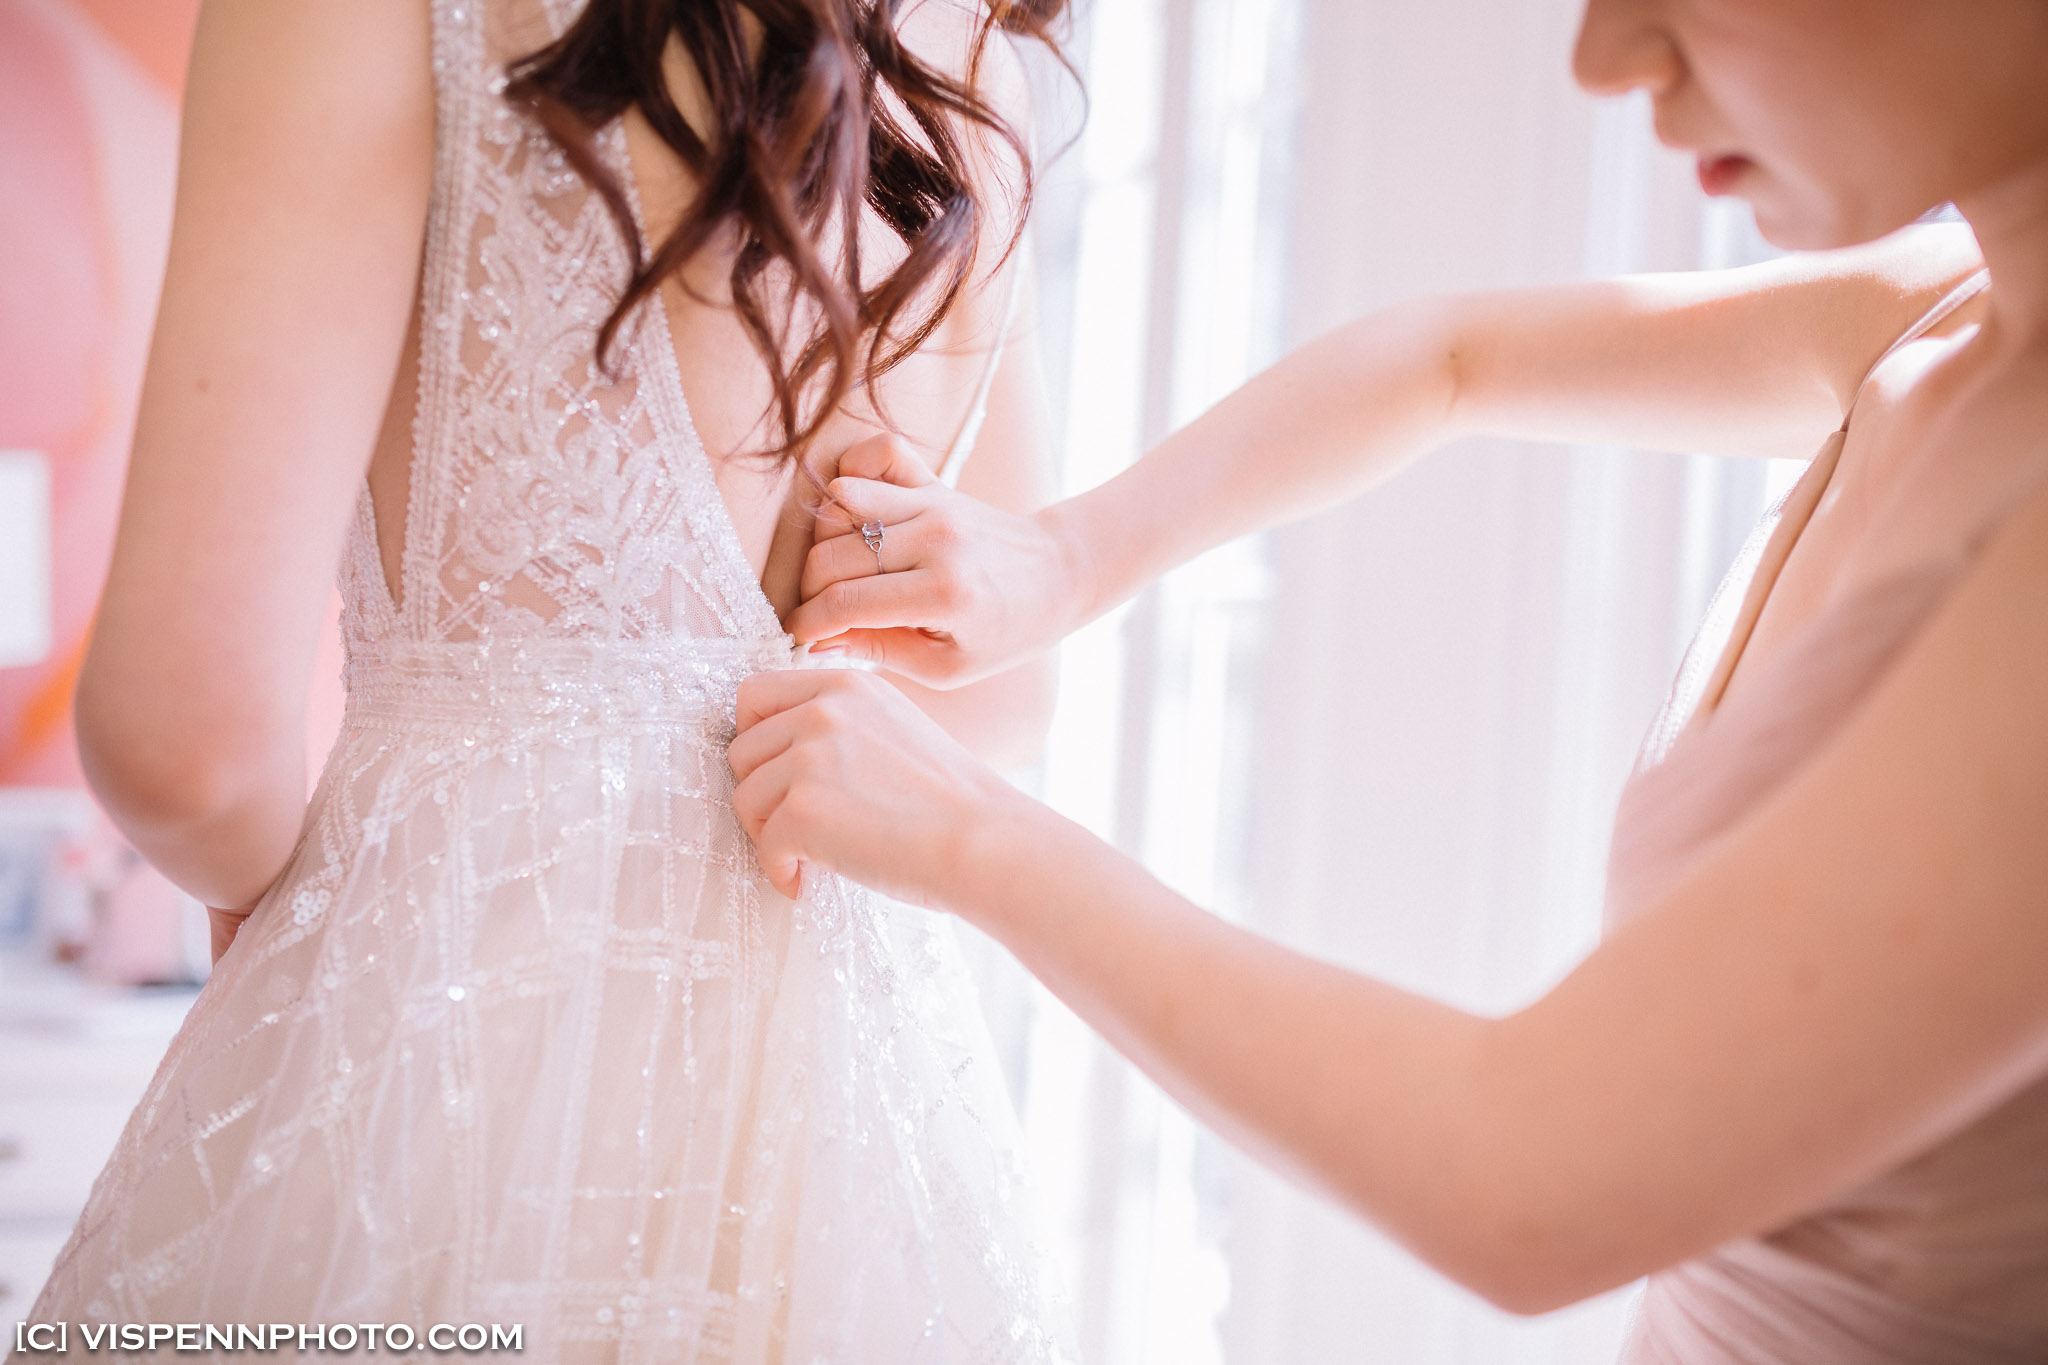 WEDDING DAY Photography Melbourne ZHPENN 0044 5D4 1511